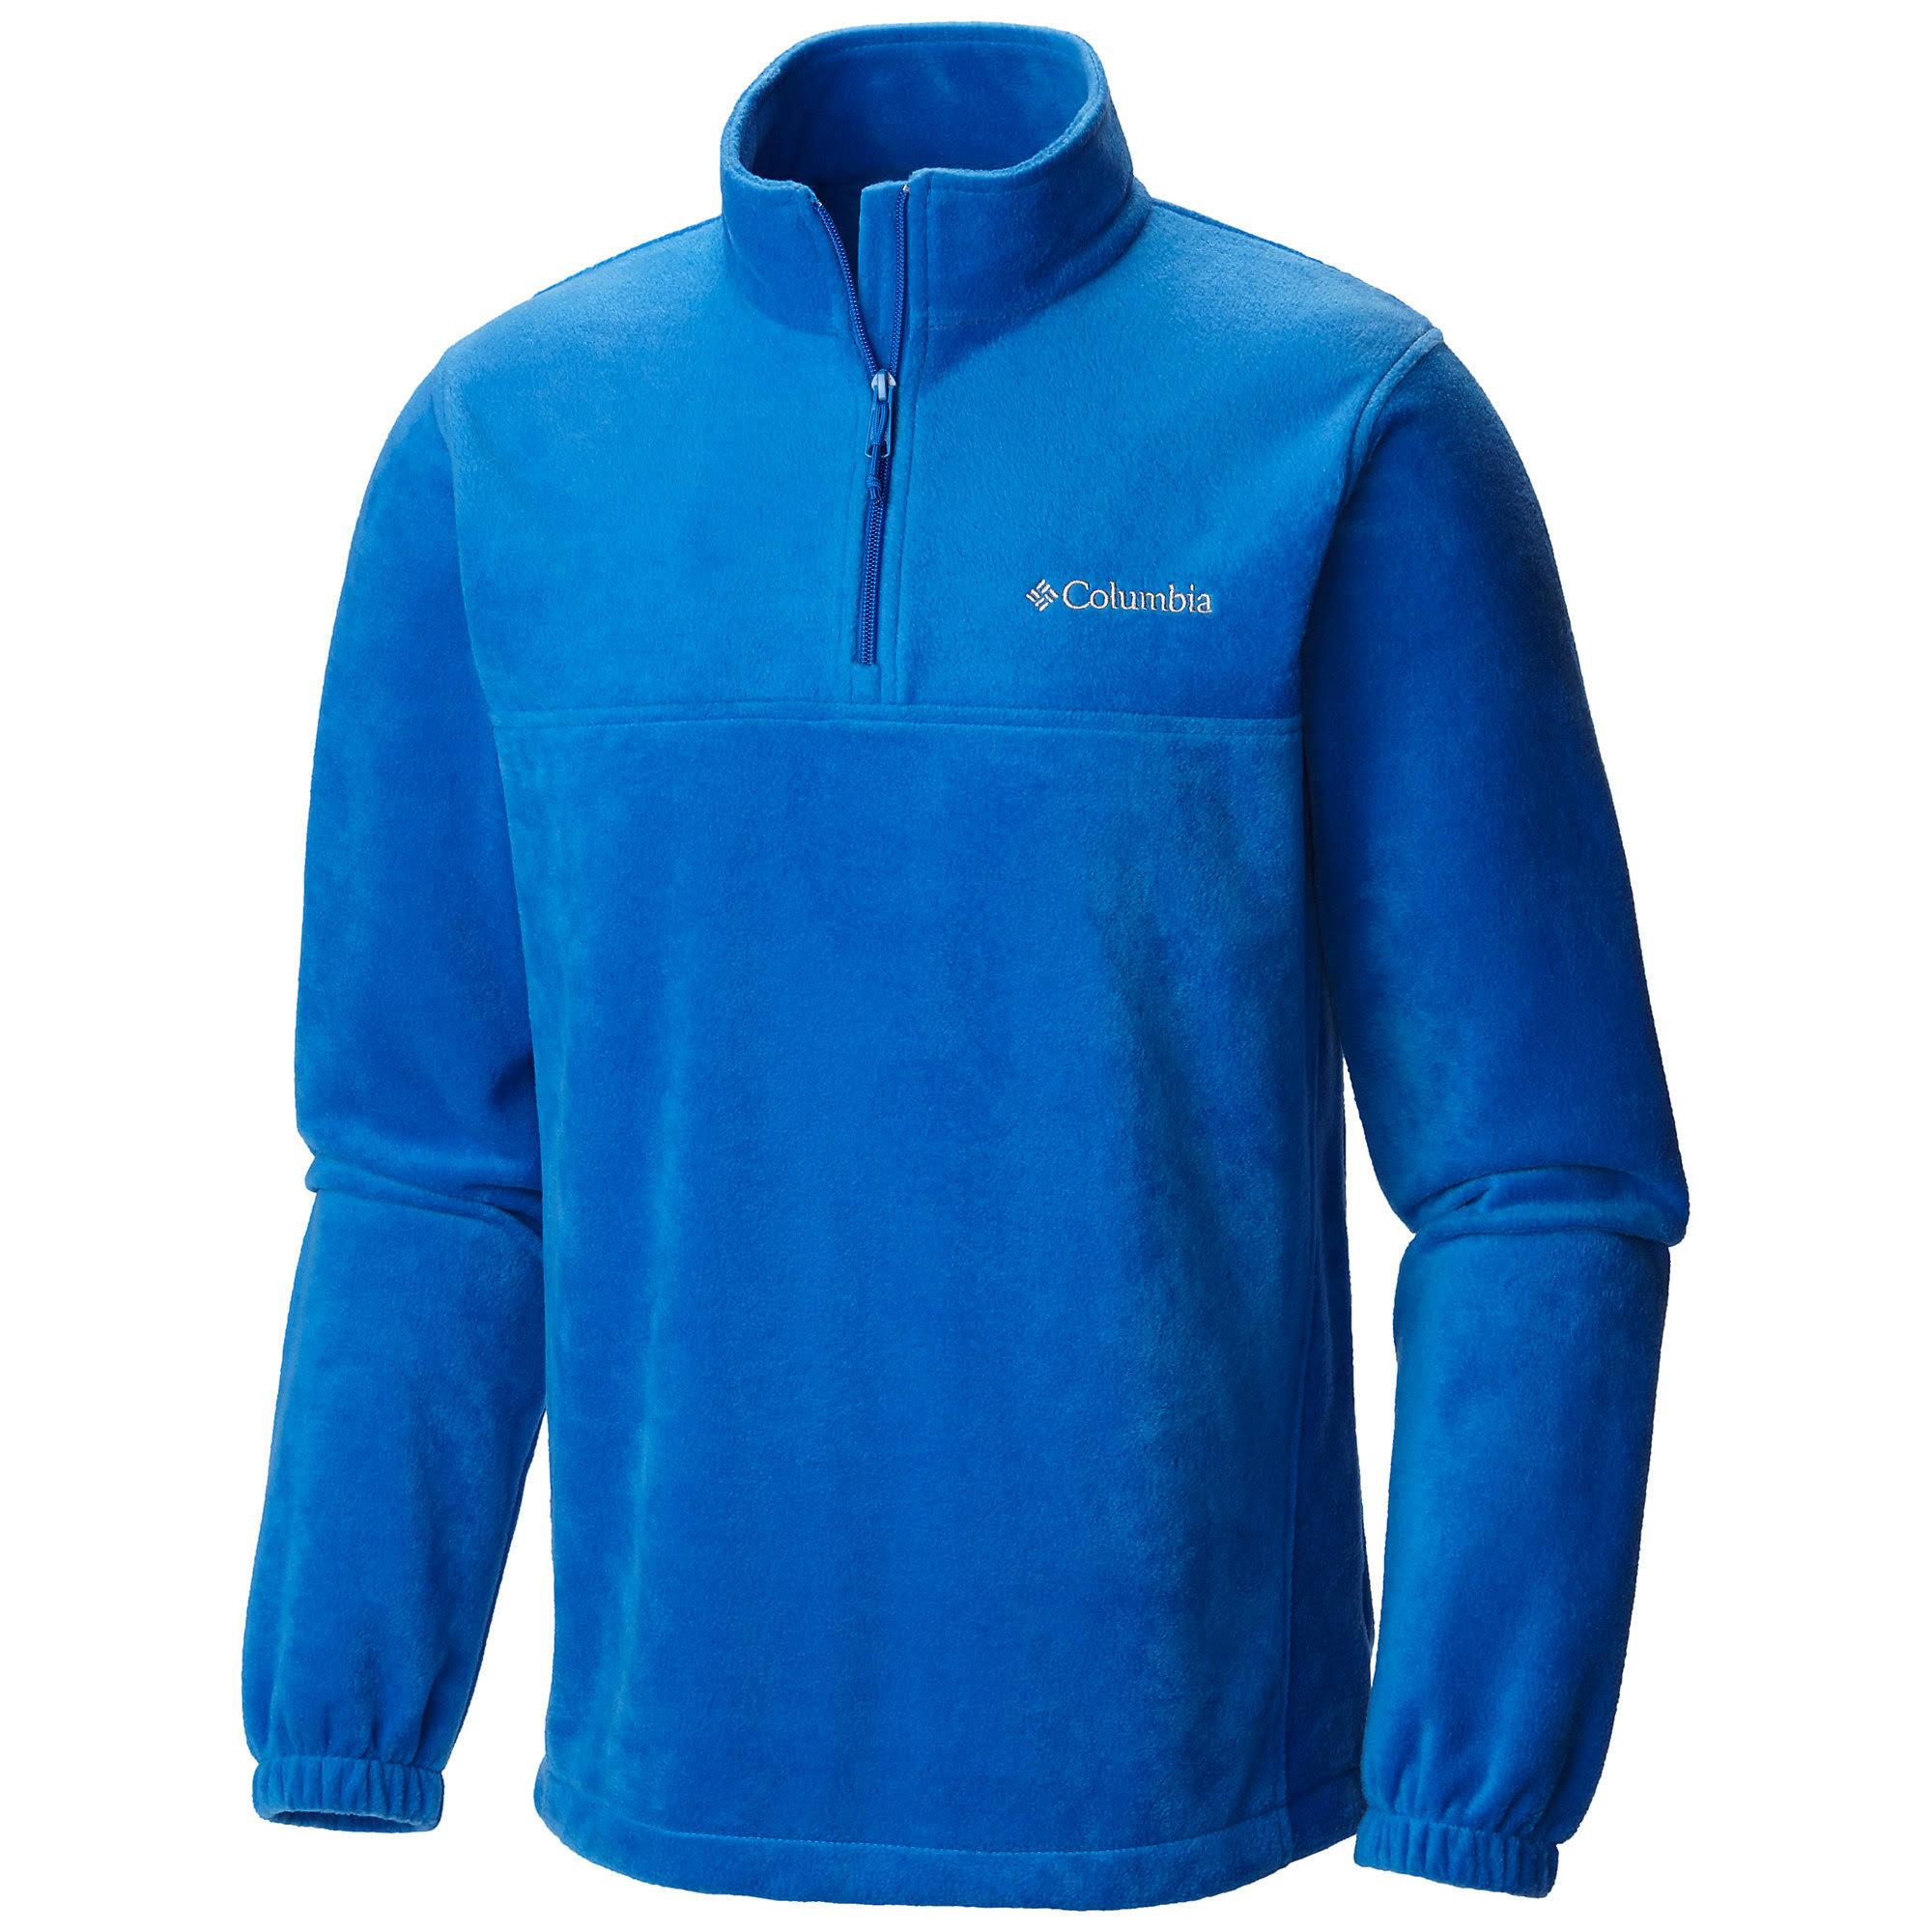 Paño Hombre Mountain Columbia Suave Grueso Para Xxl Steens Y Blue Super arSa0q